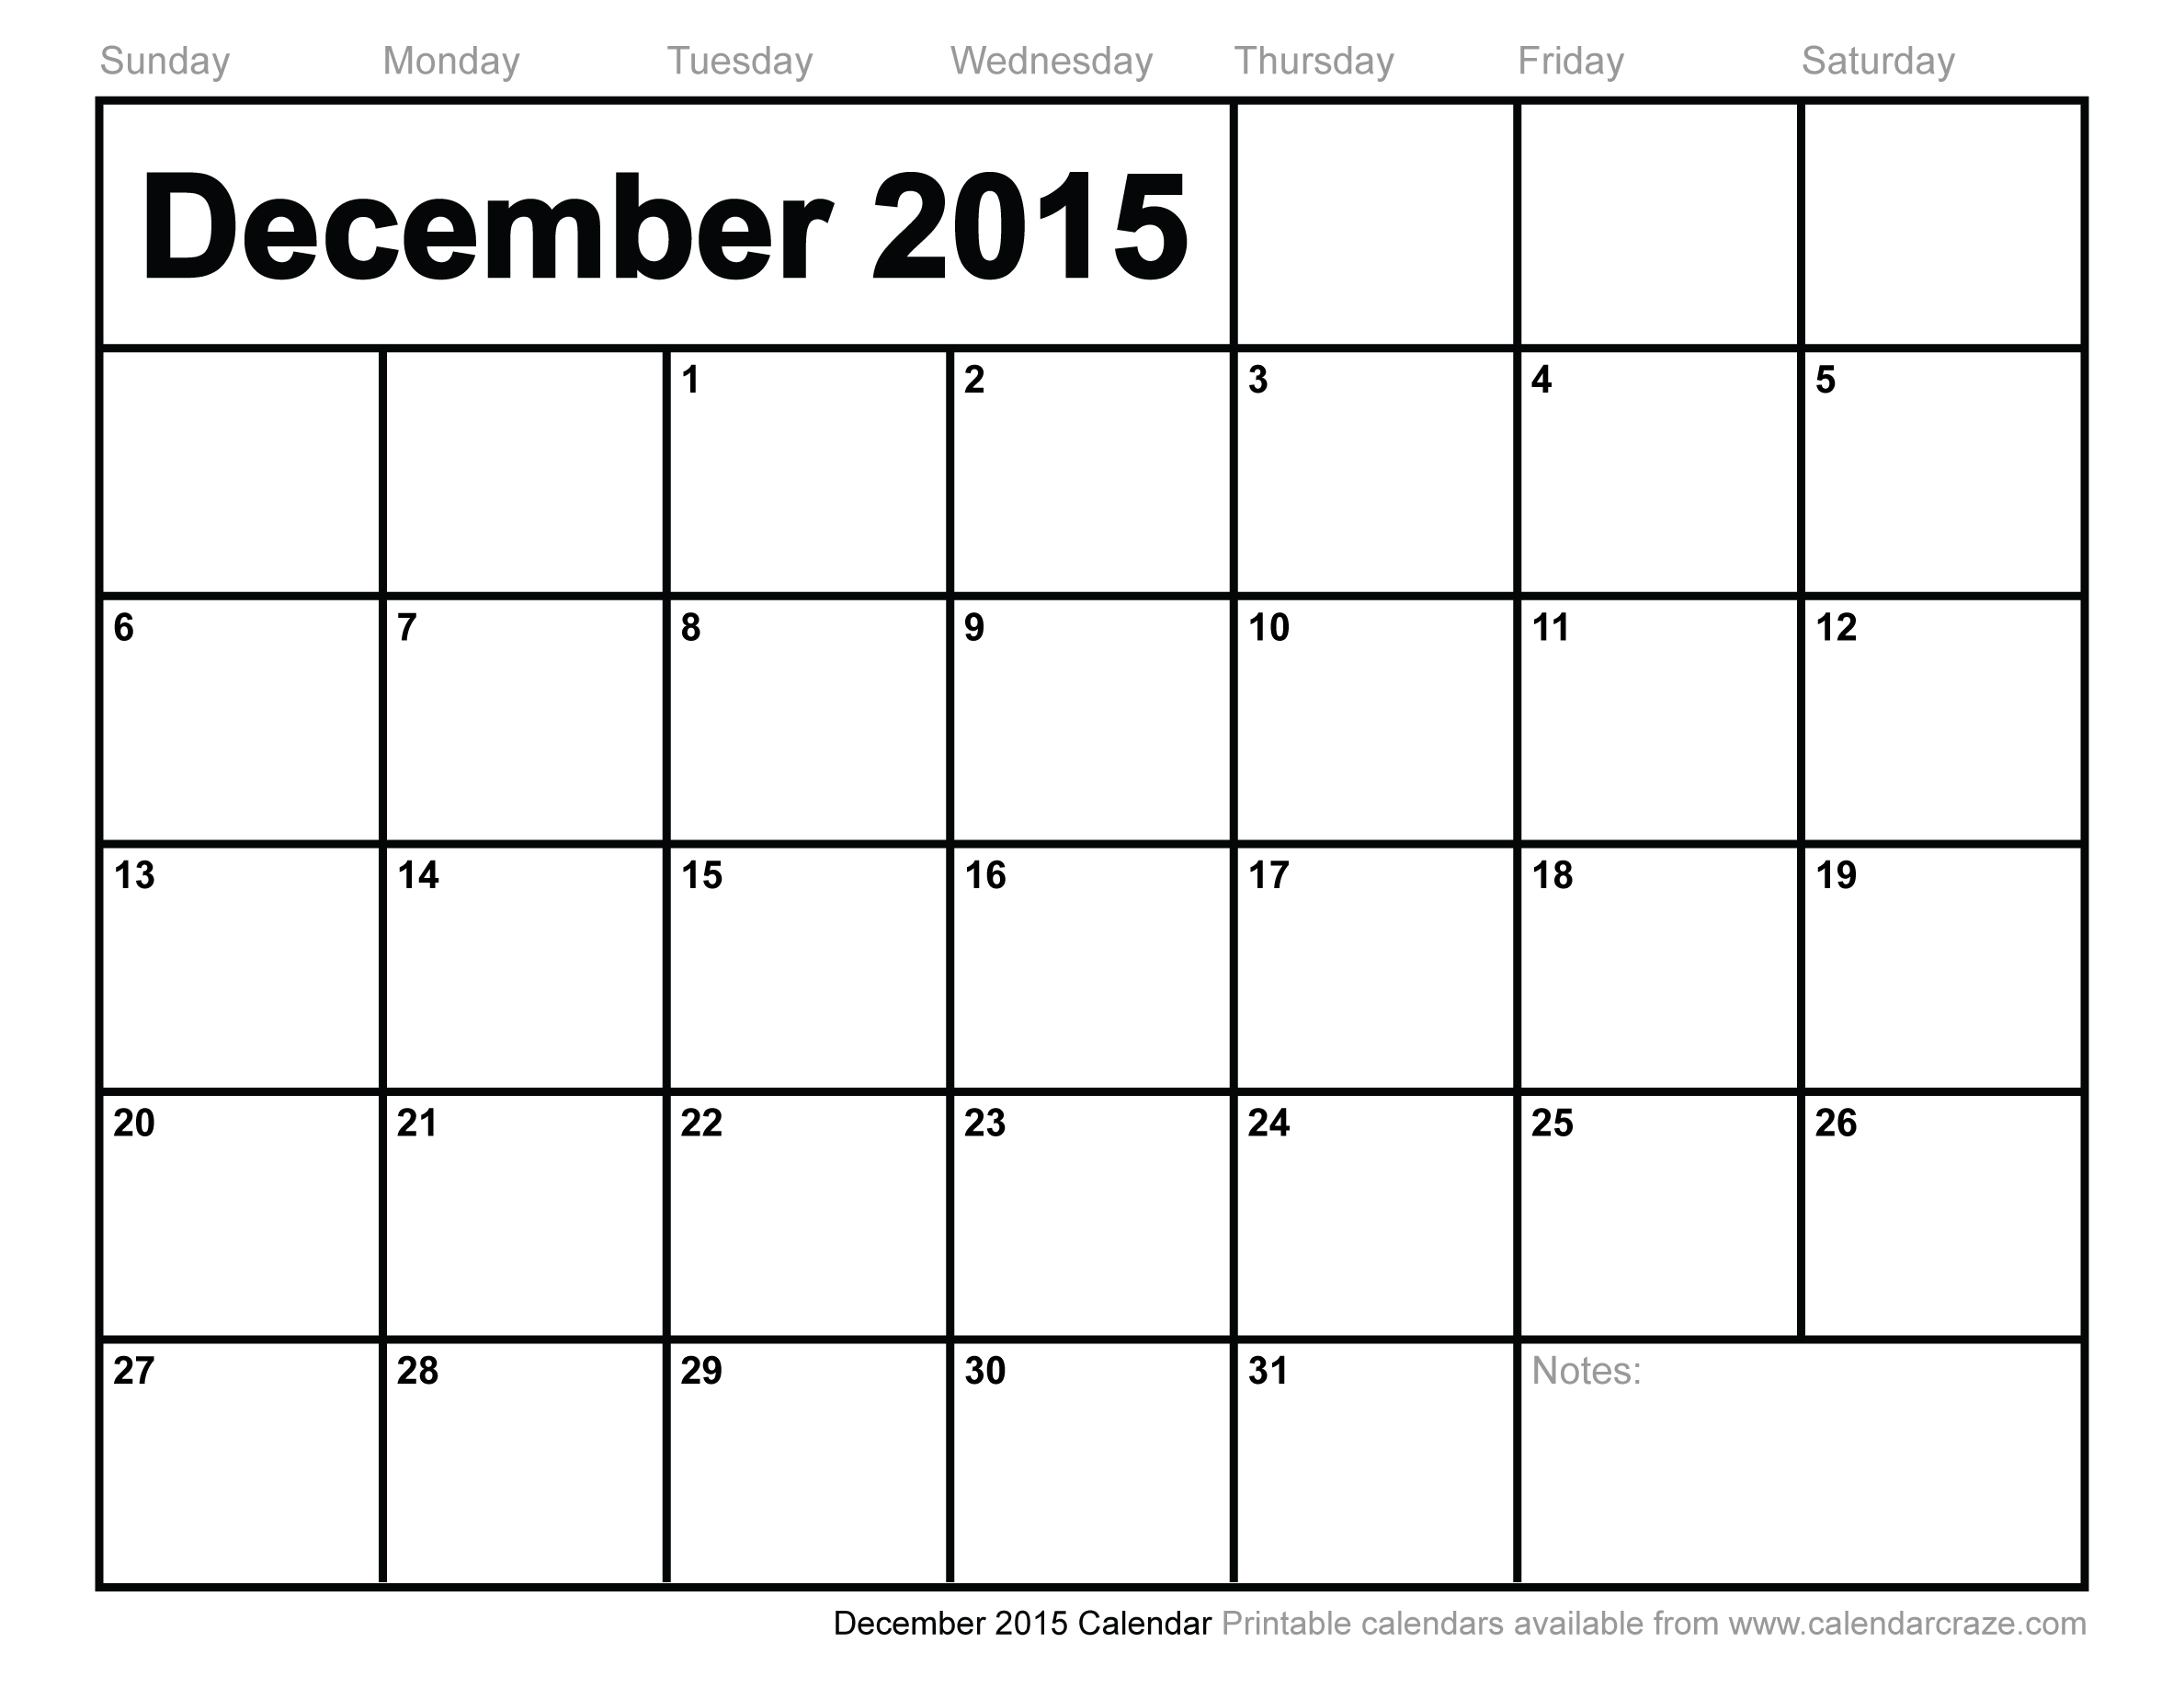 December 2016 Calendar Waterproof | free calendar 2017